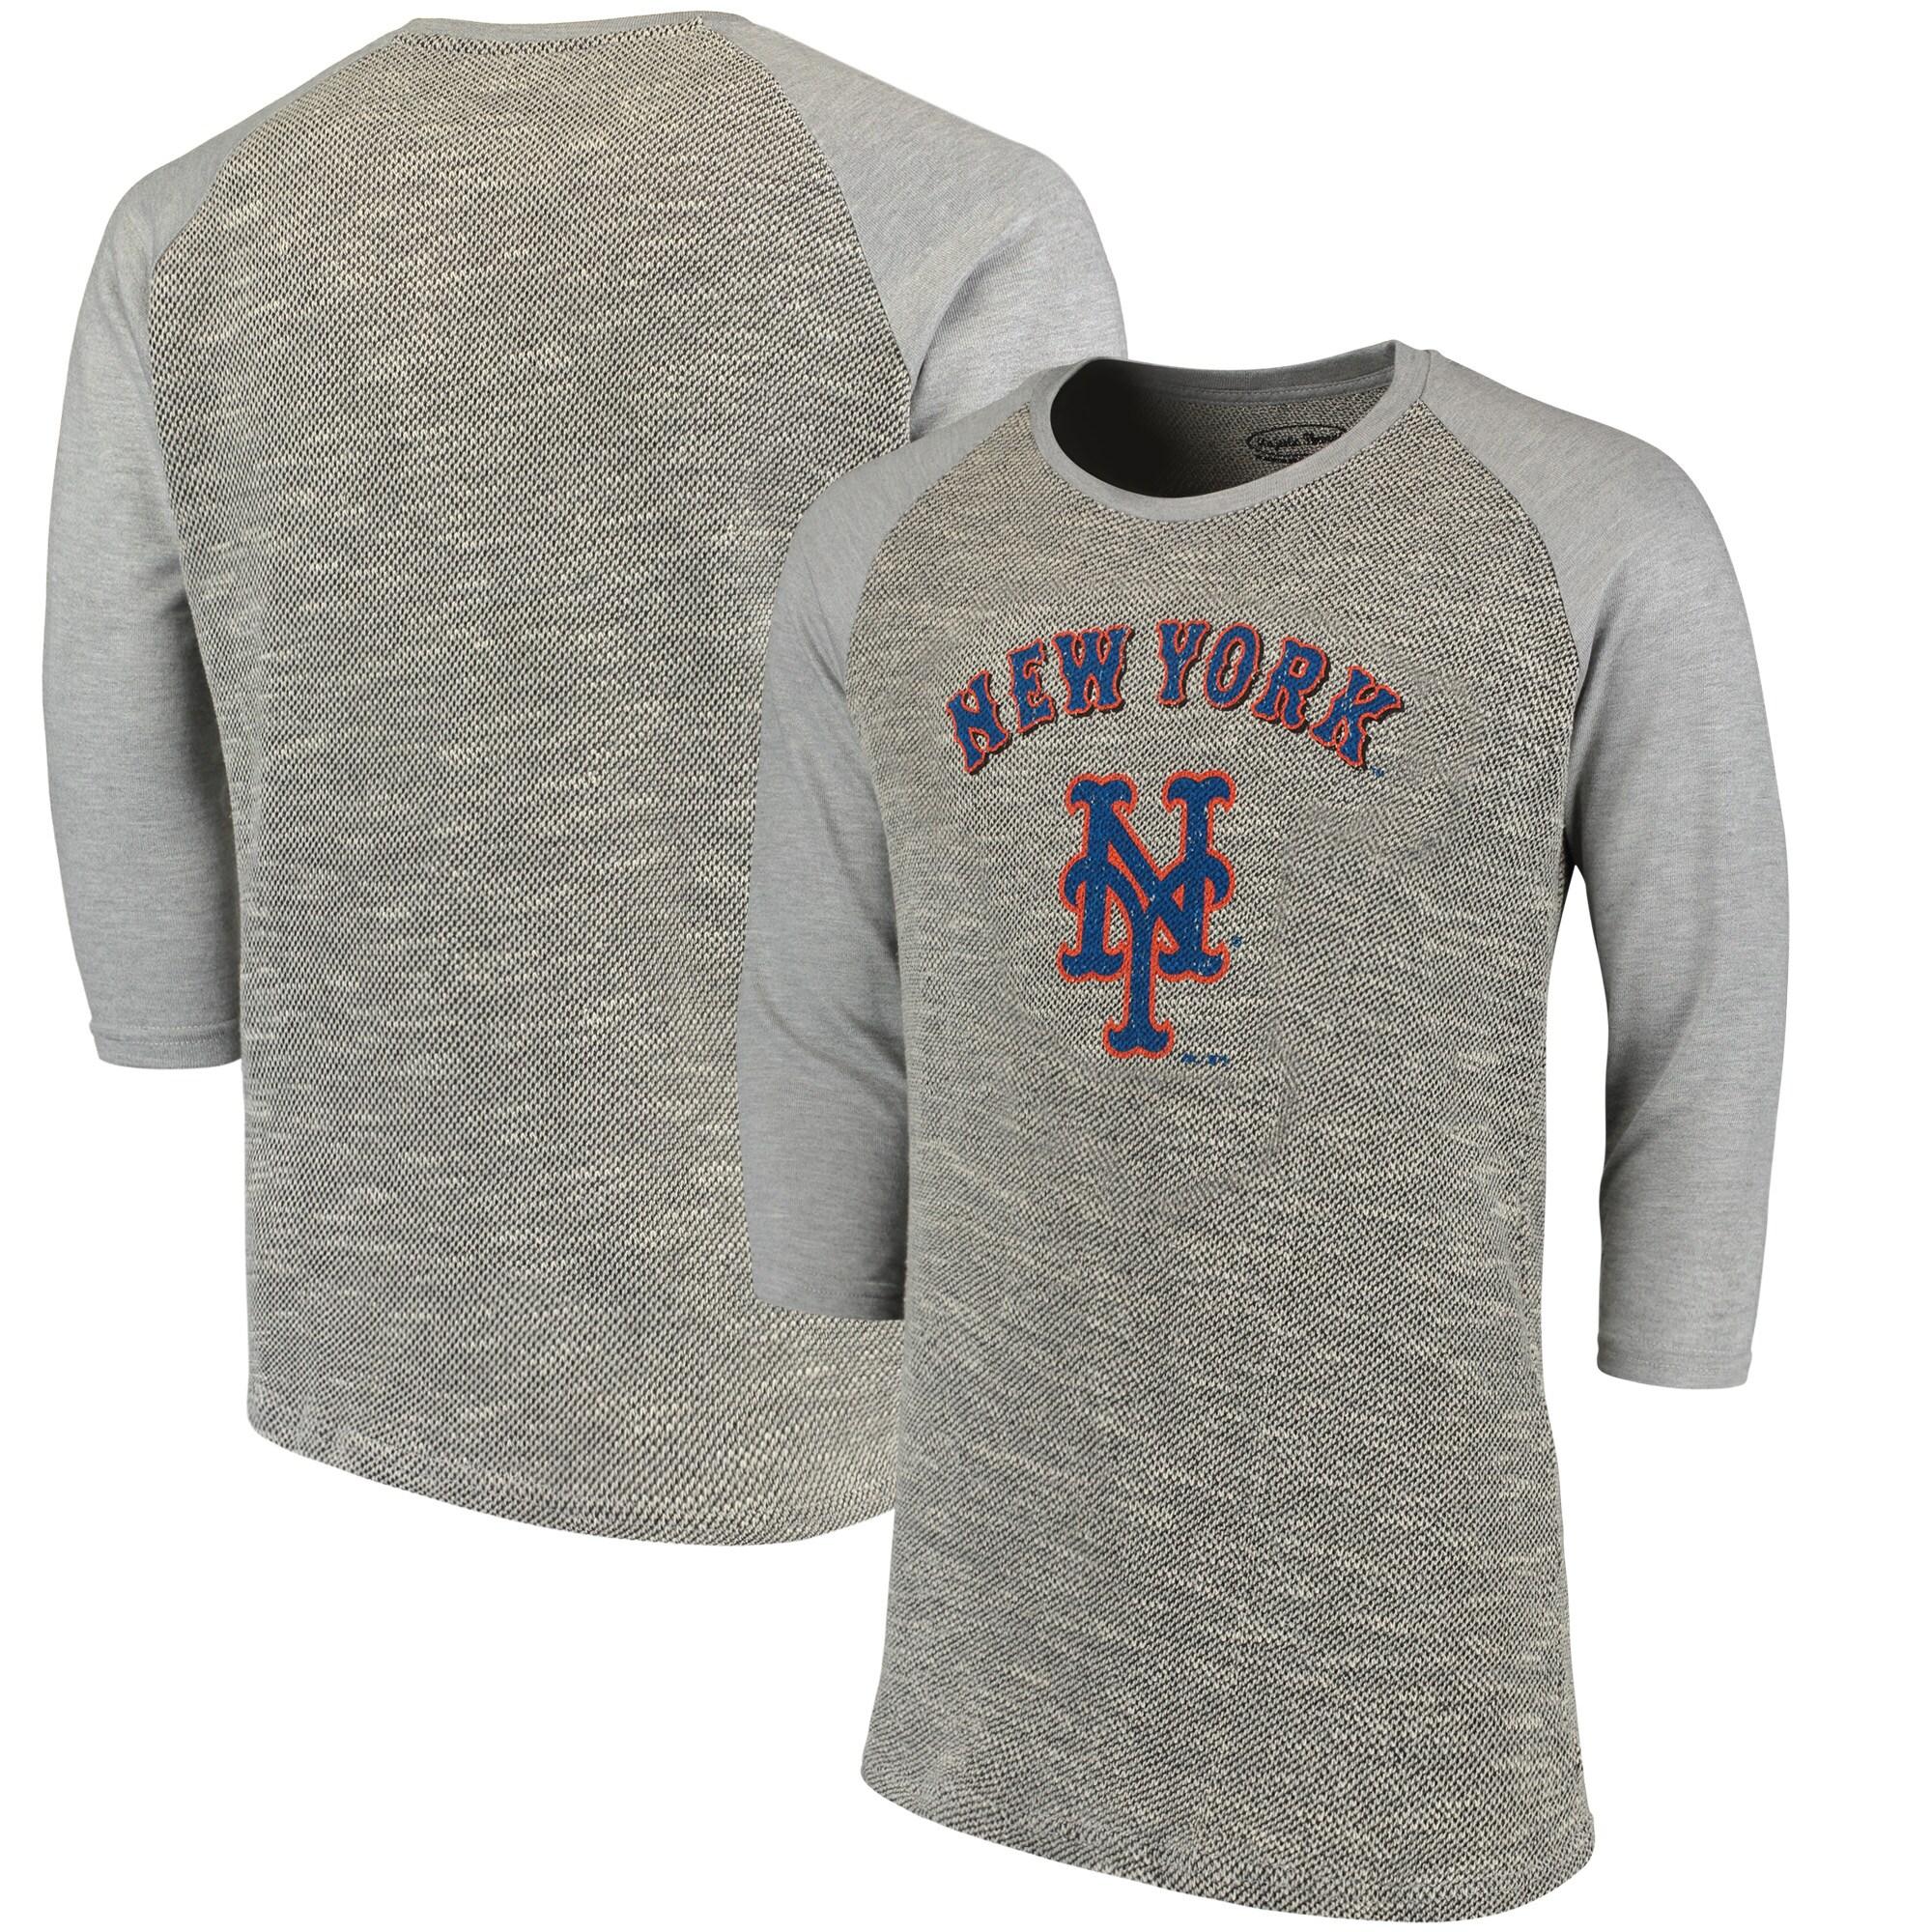 New York Mets Majestic Threads Tri-Yarn French Terry 3/4-Sleeve Raglan T-Shirt - Gray